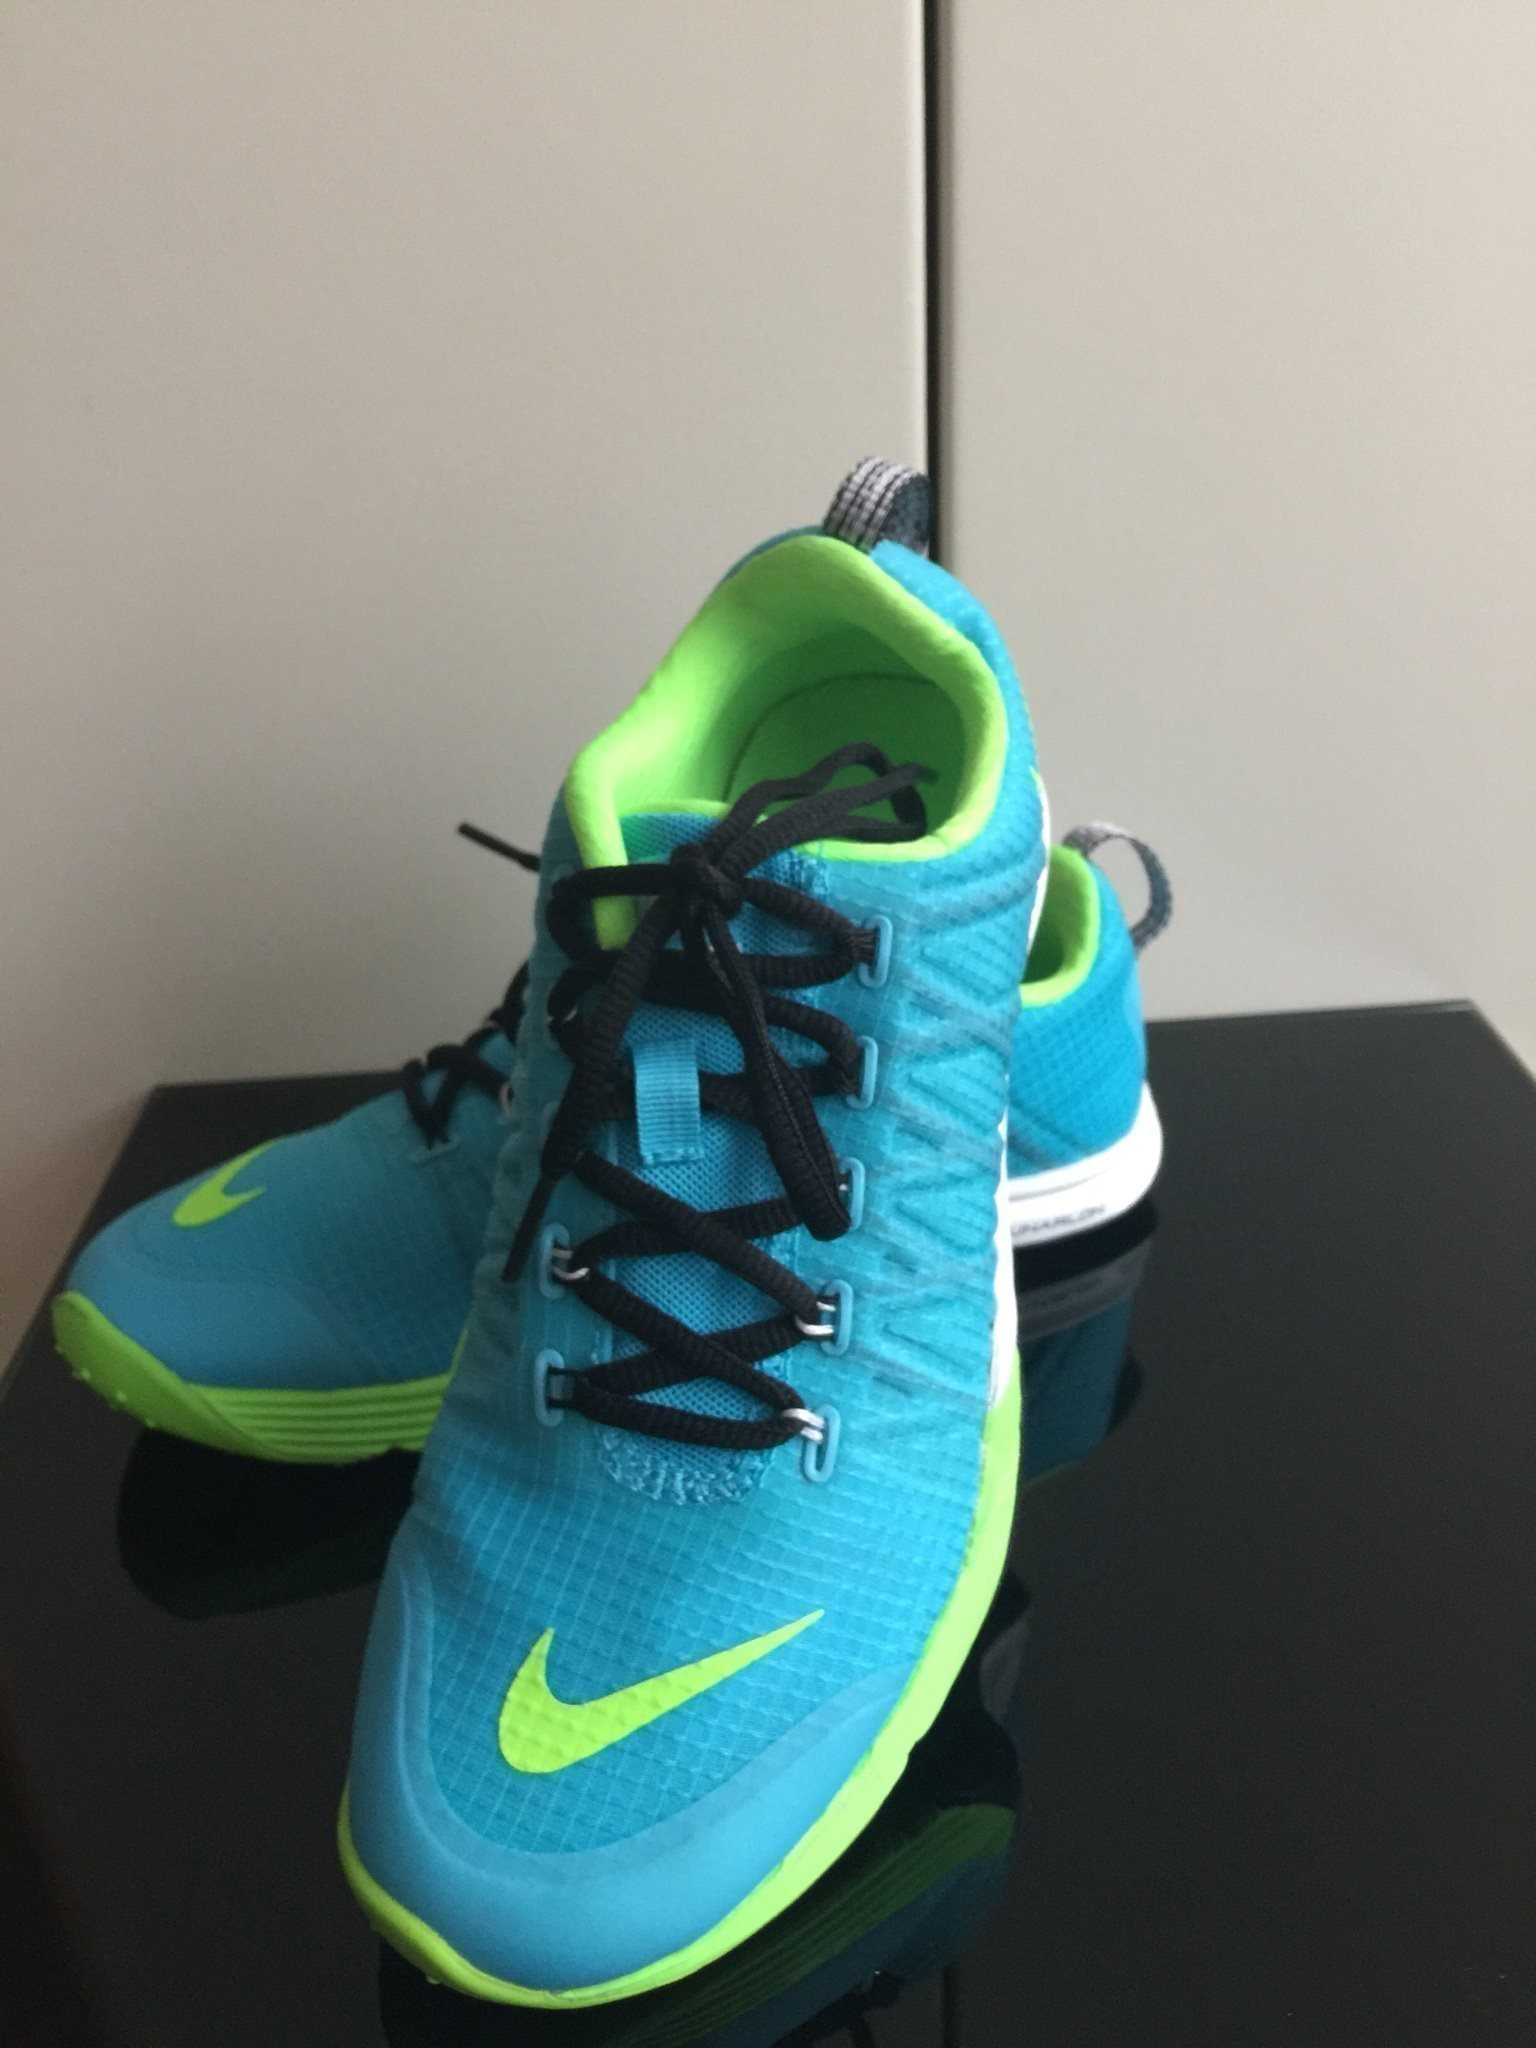 100% authentic b8189 48ca7 Nike Lunarlon storlek 39, nypris 1099kr, ...